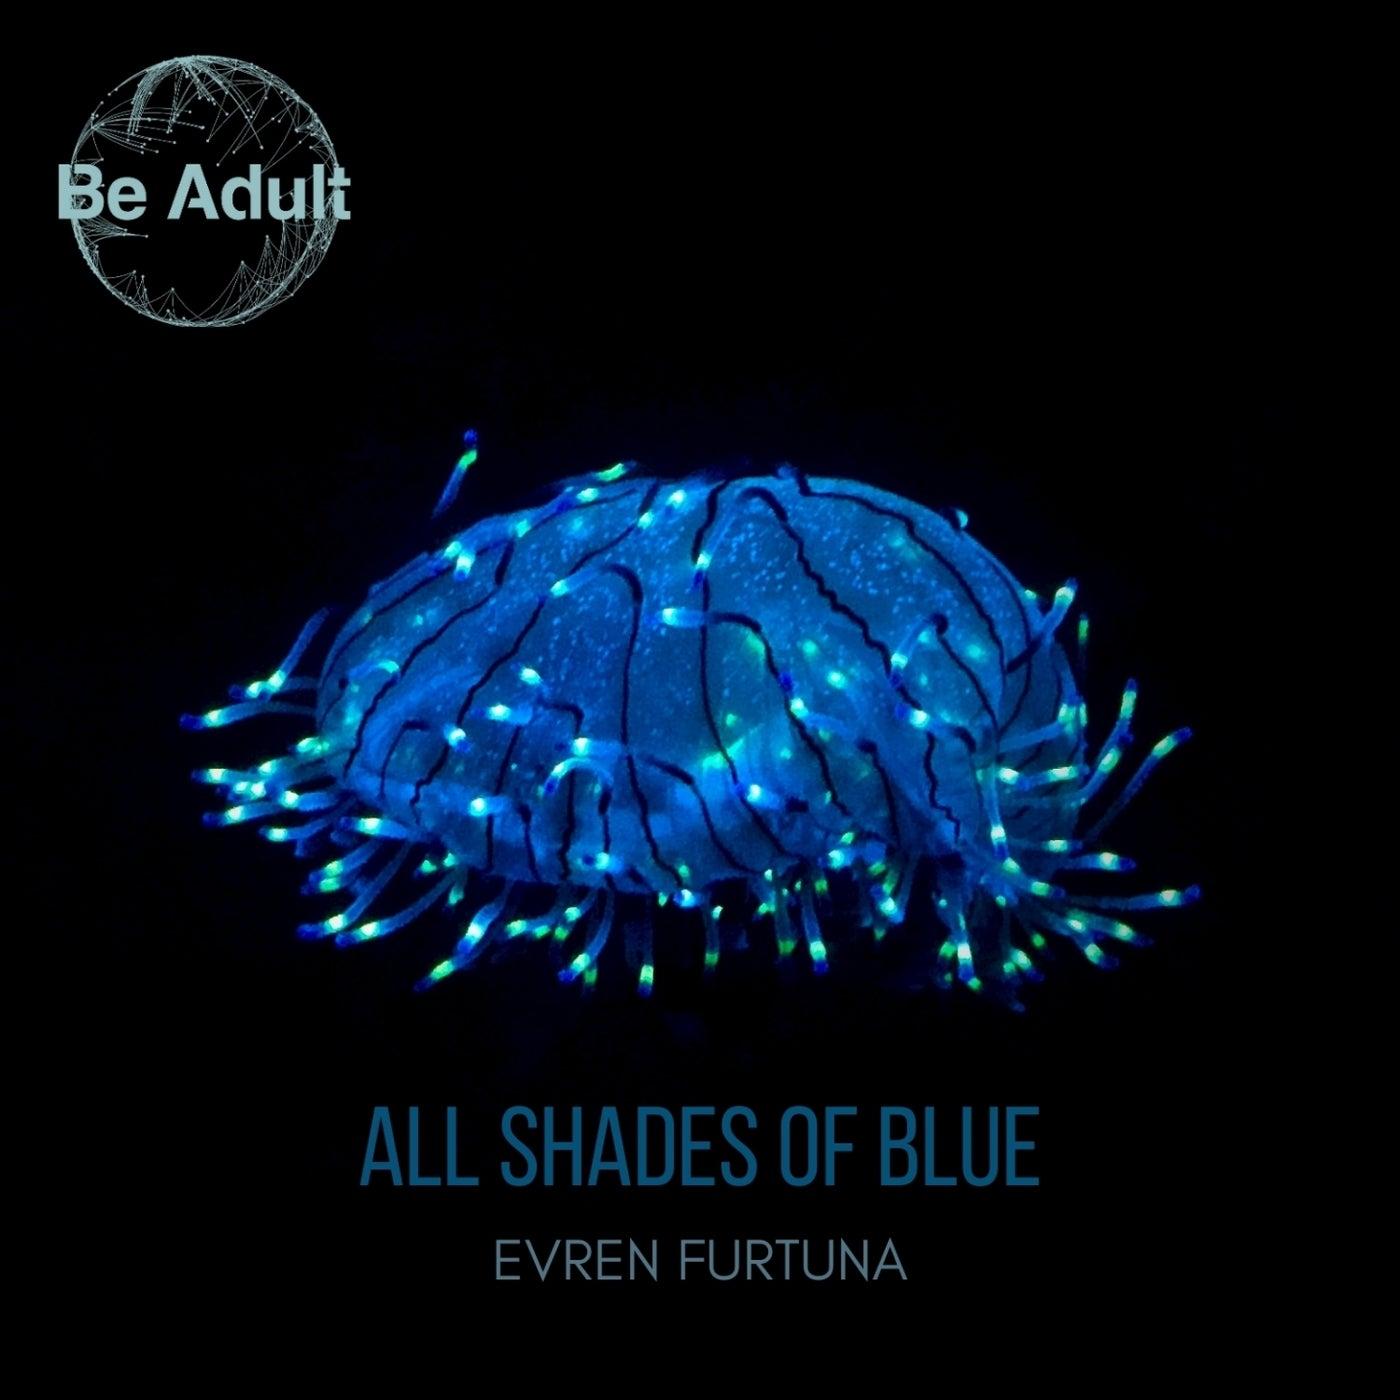 All Shades of Blue (Original Mix)